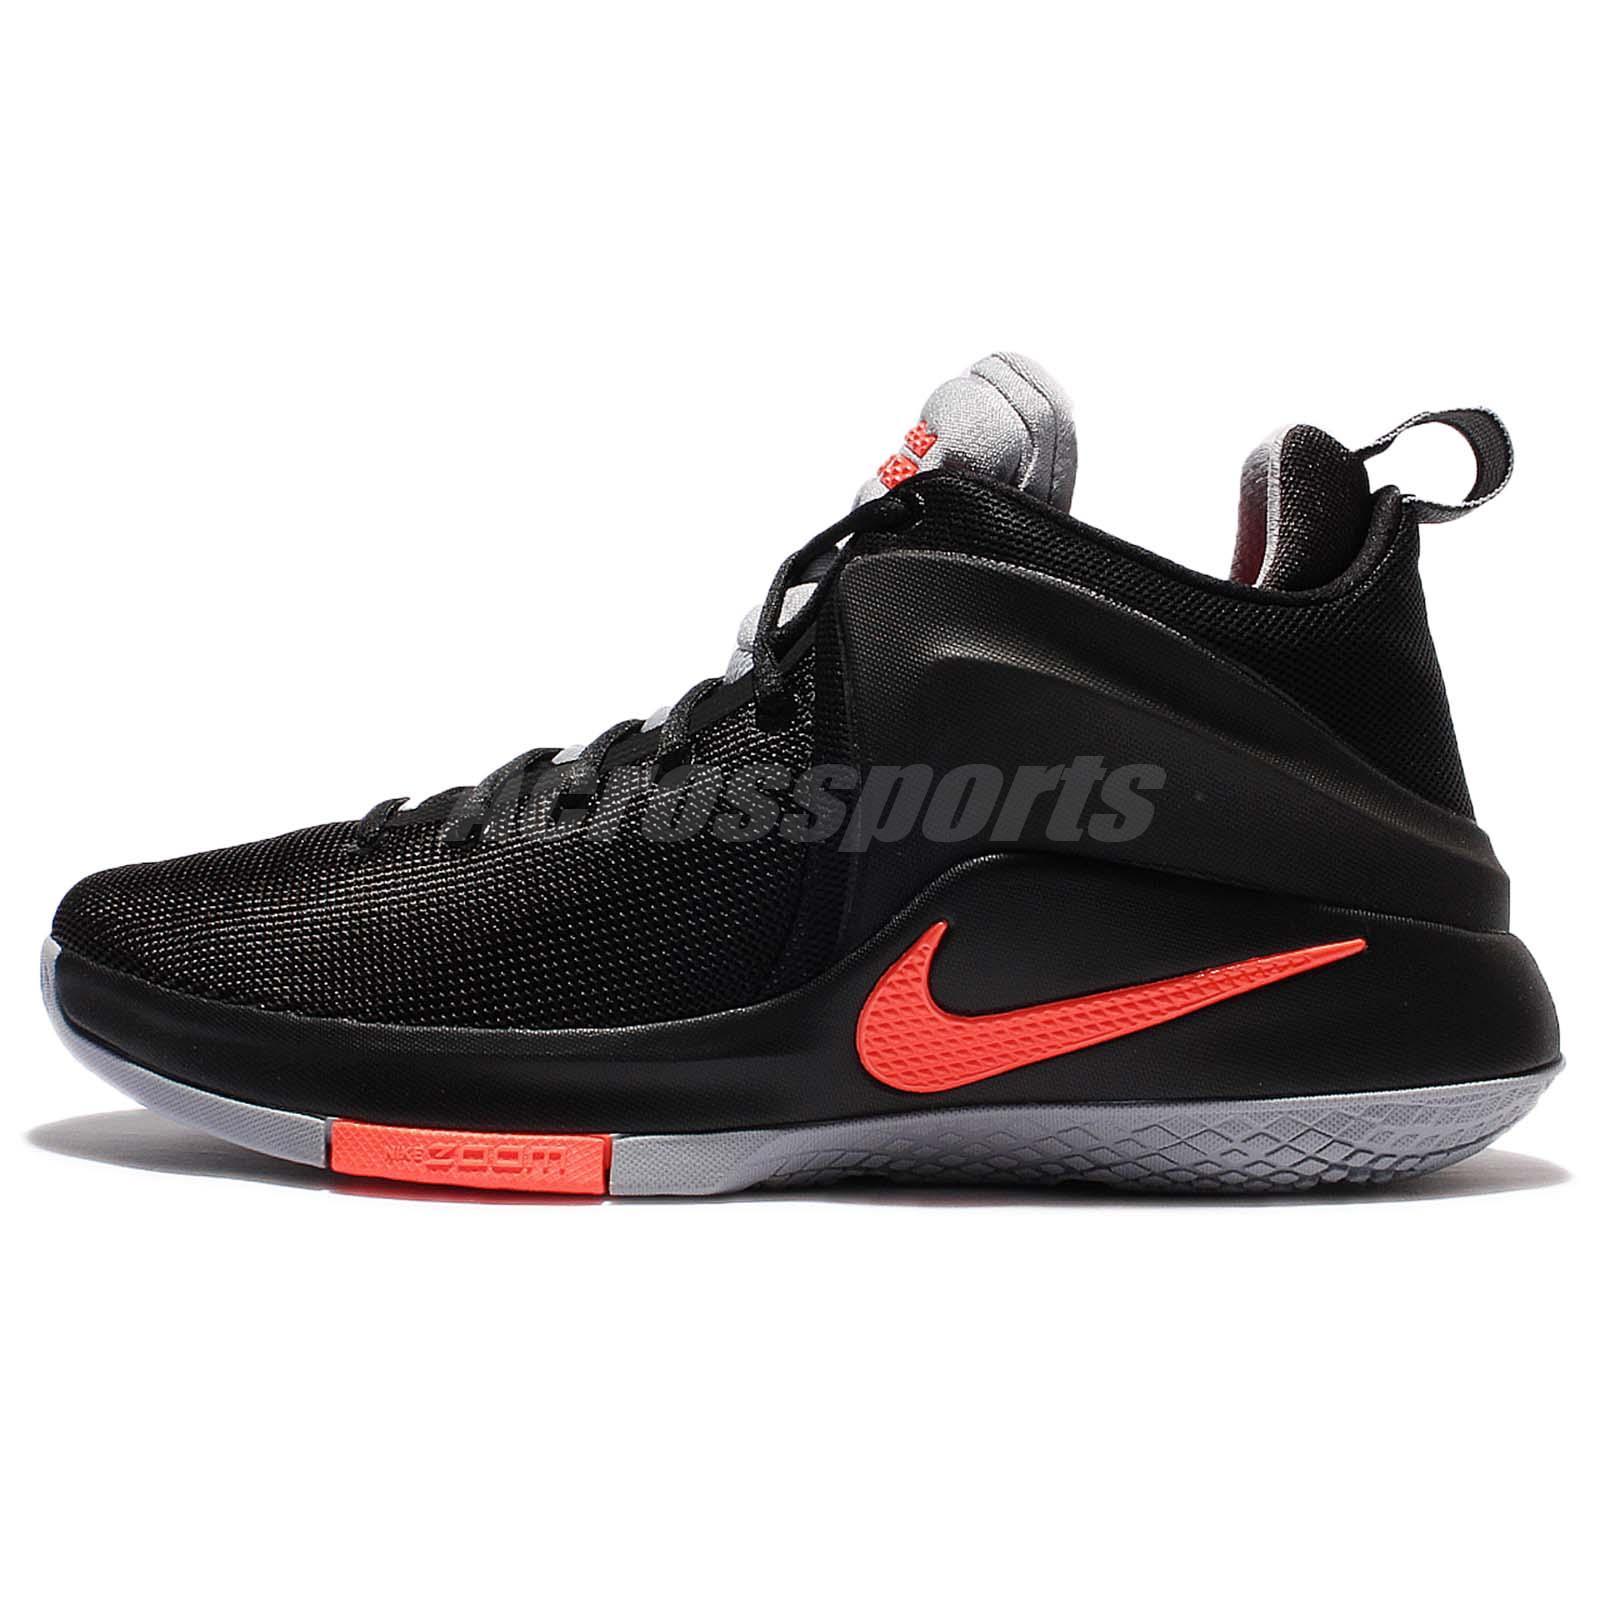 super popular 9a2d5 36be2 Nike Zoom Witness EP Lebron James Black Men Basketball Shoes 884277